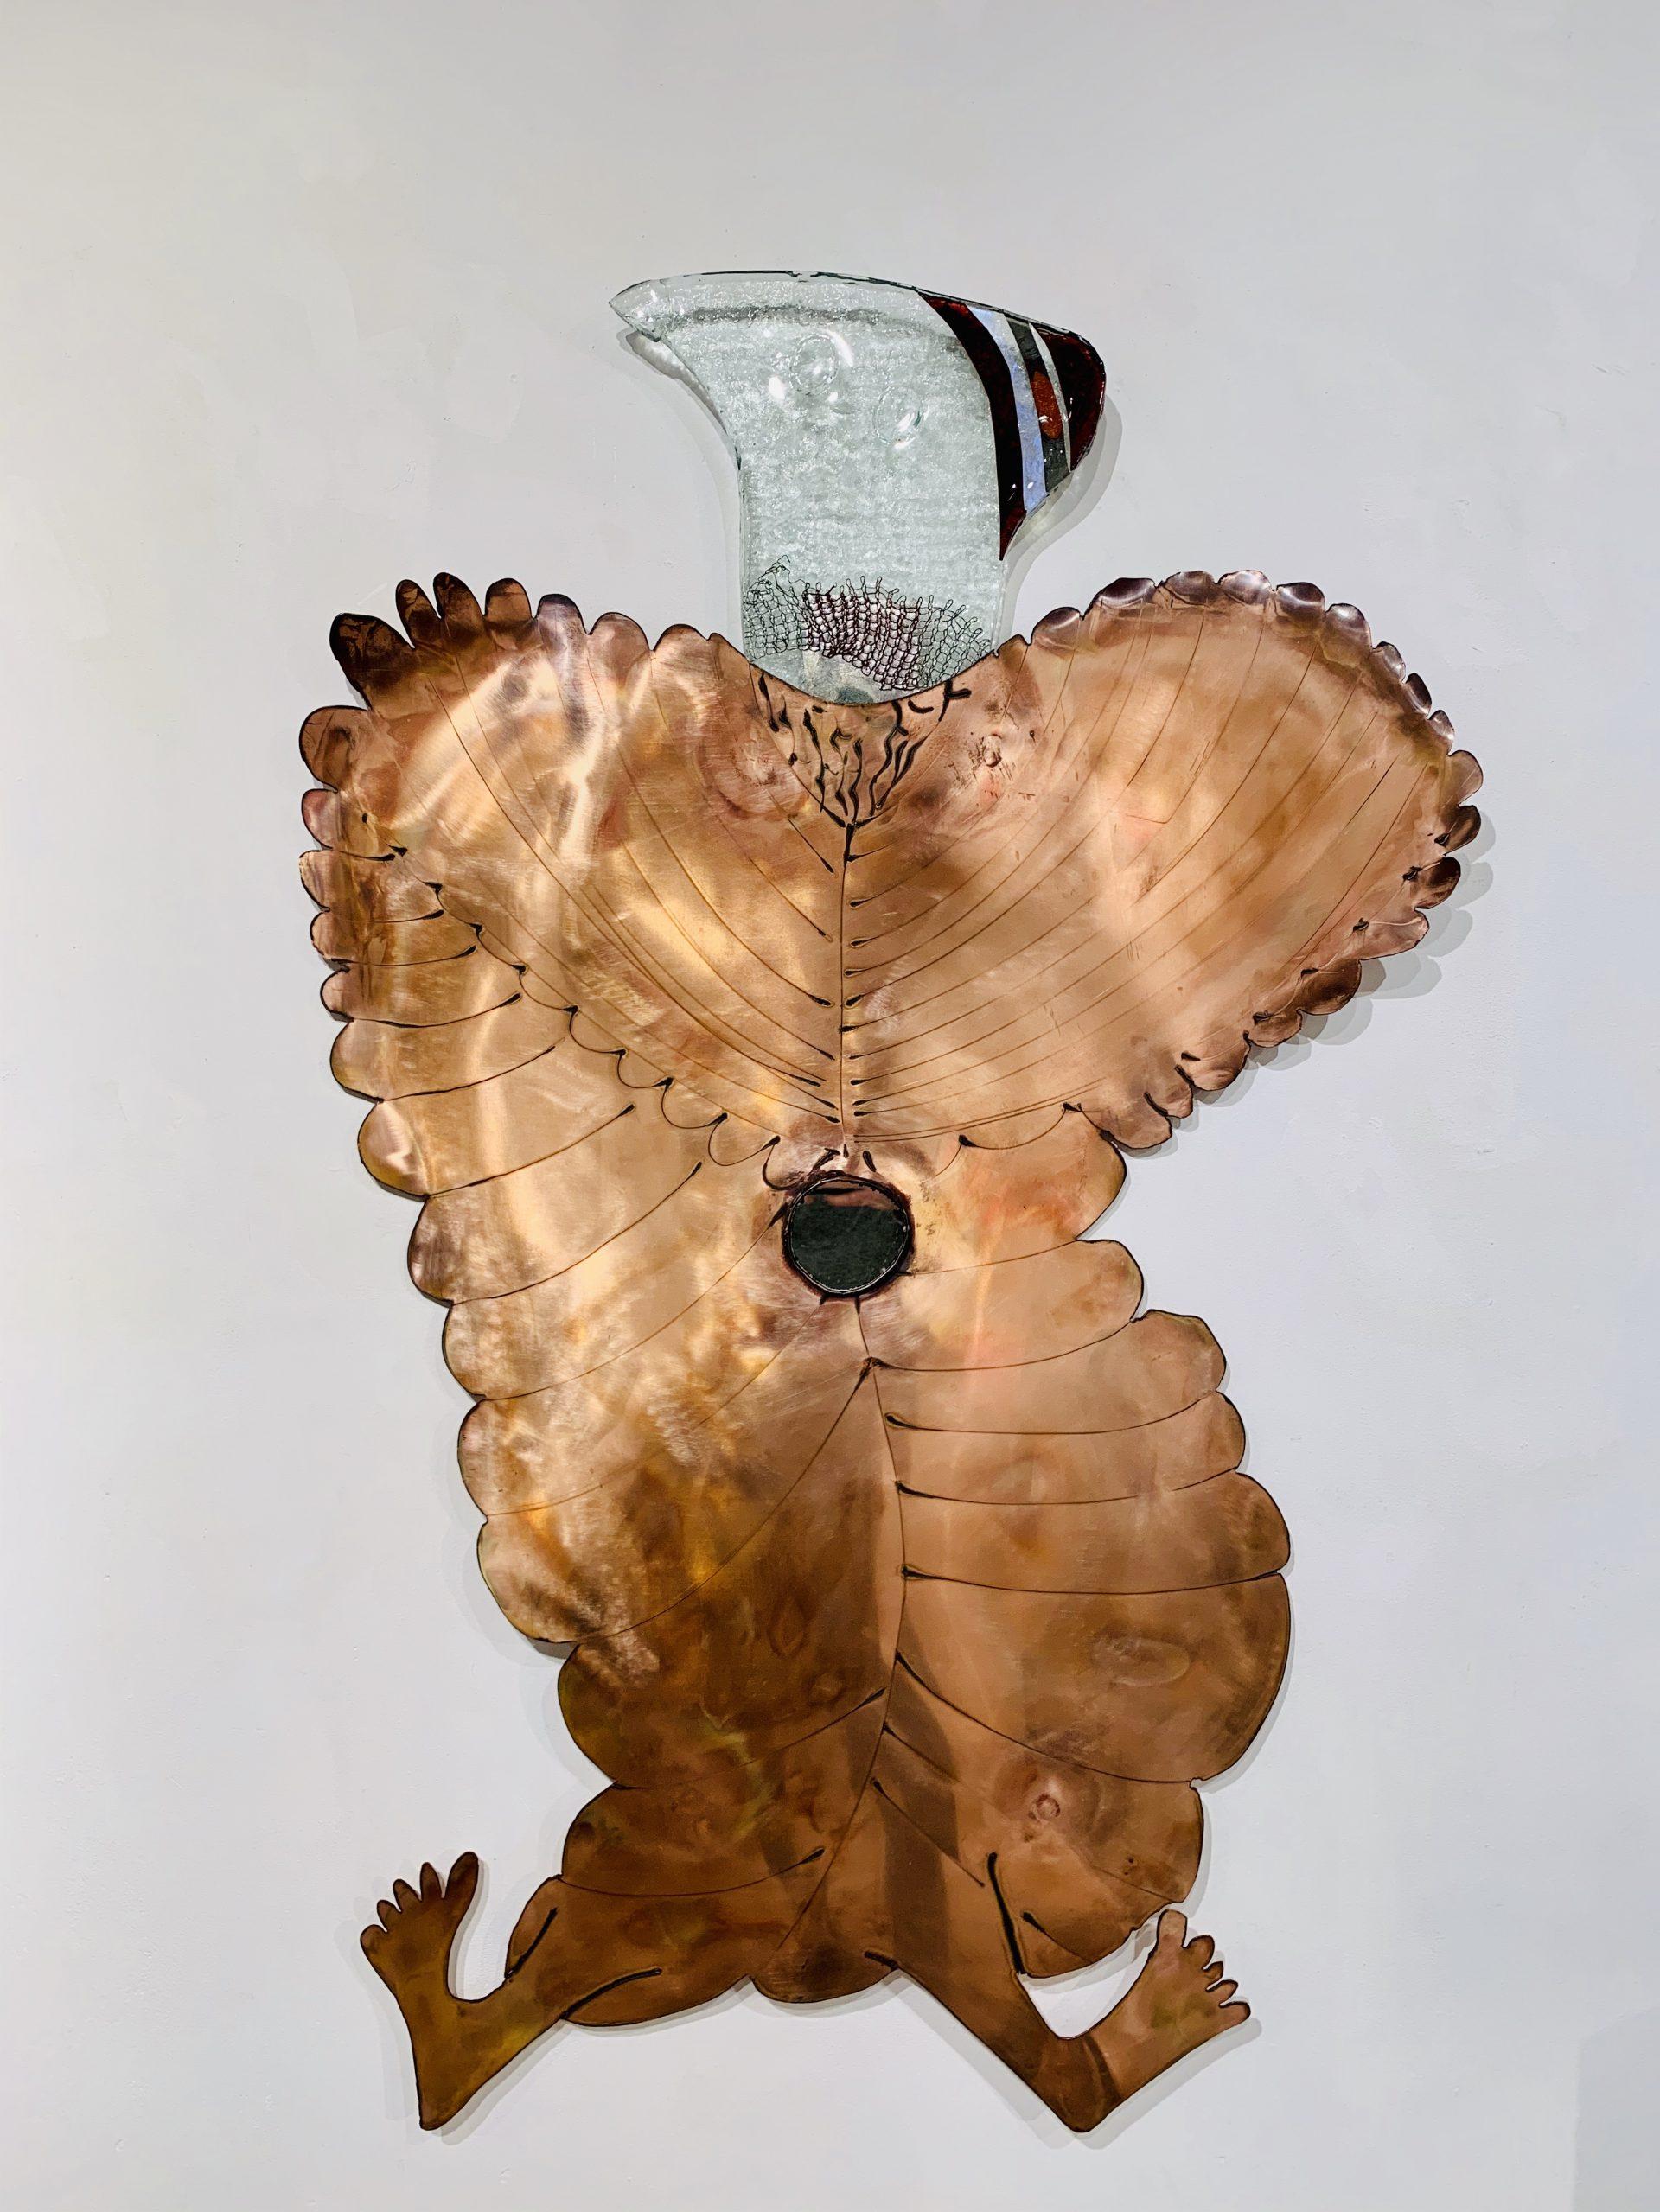 Wandobject Back to an original image 120x75 cm koper brons glas 2 Sjaak Smetsers